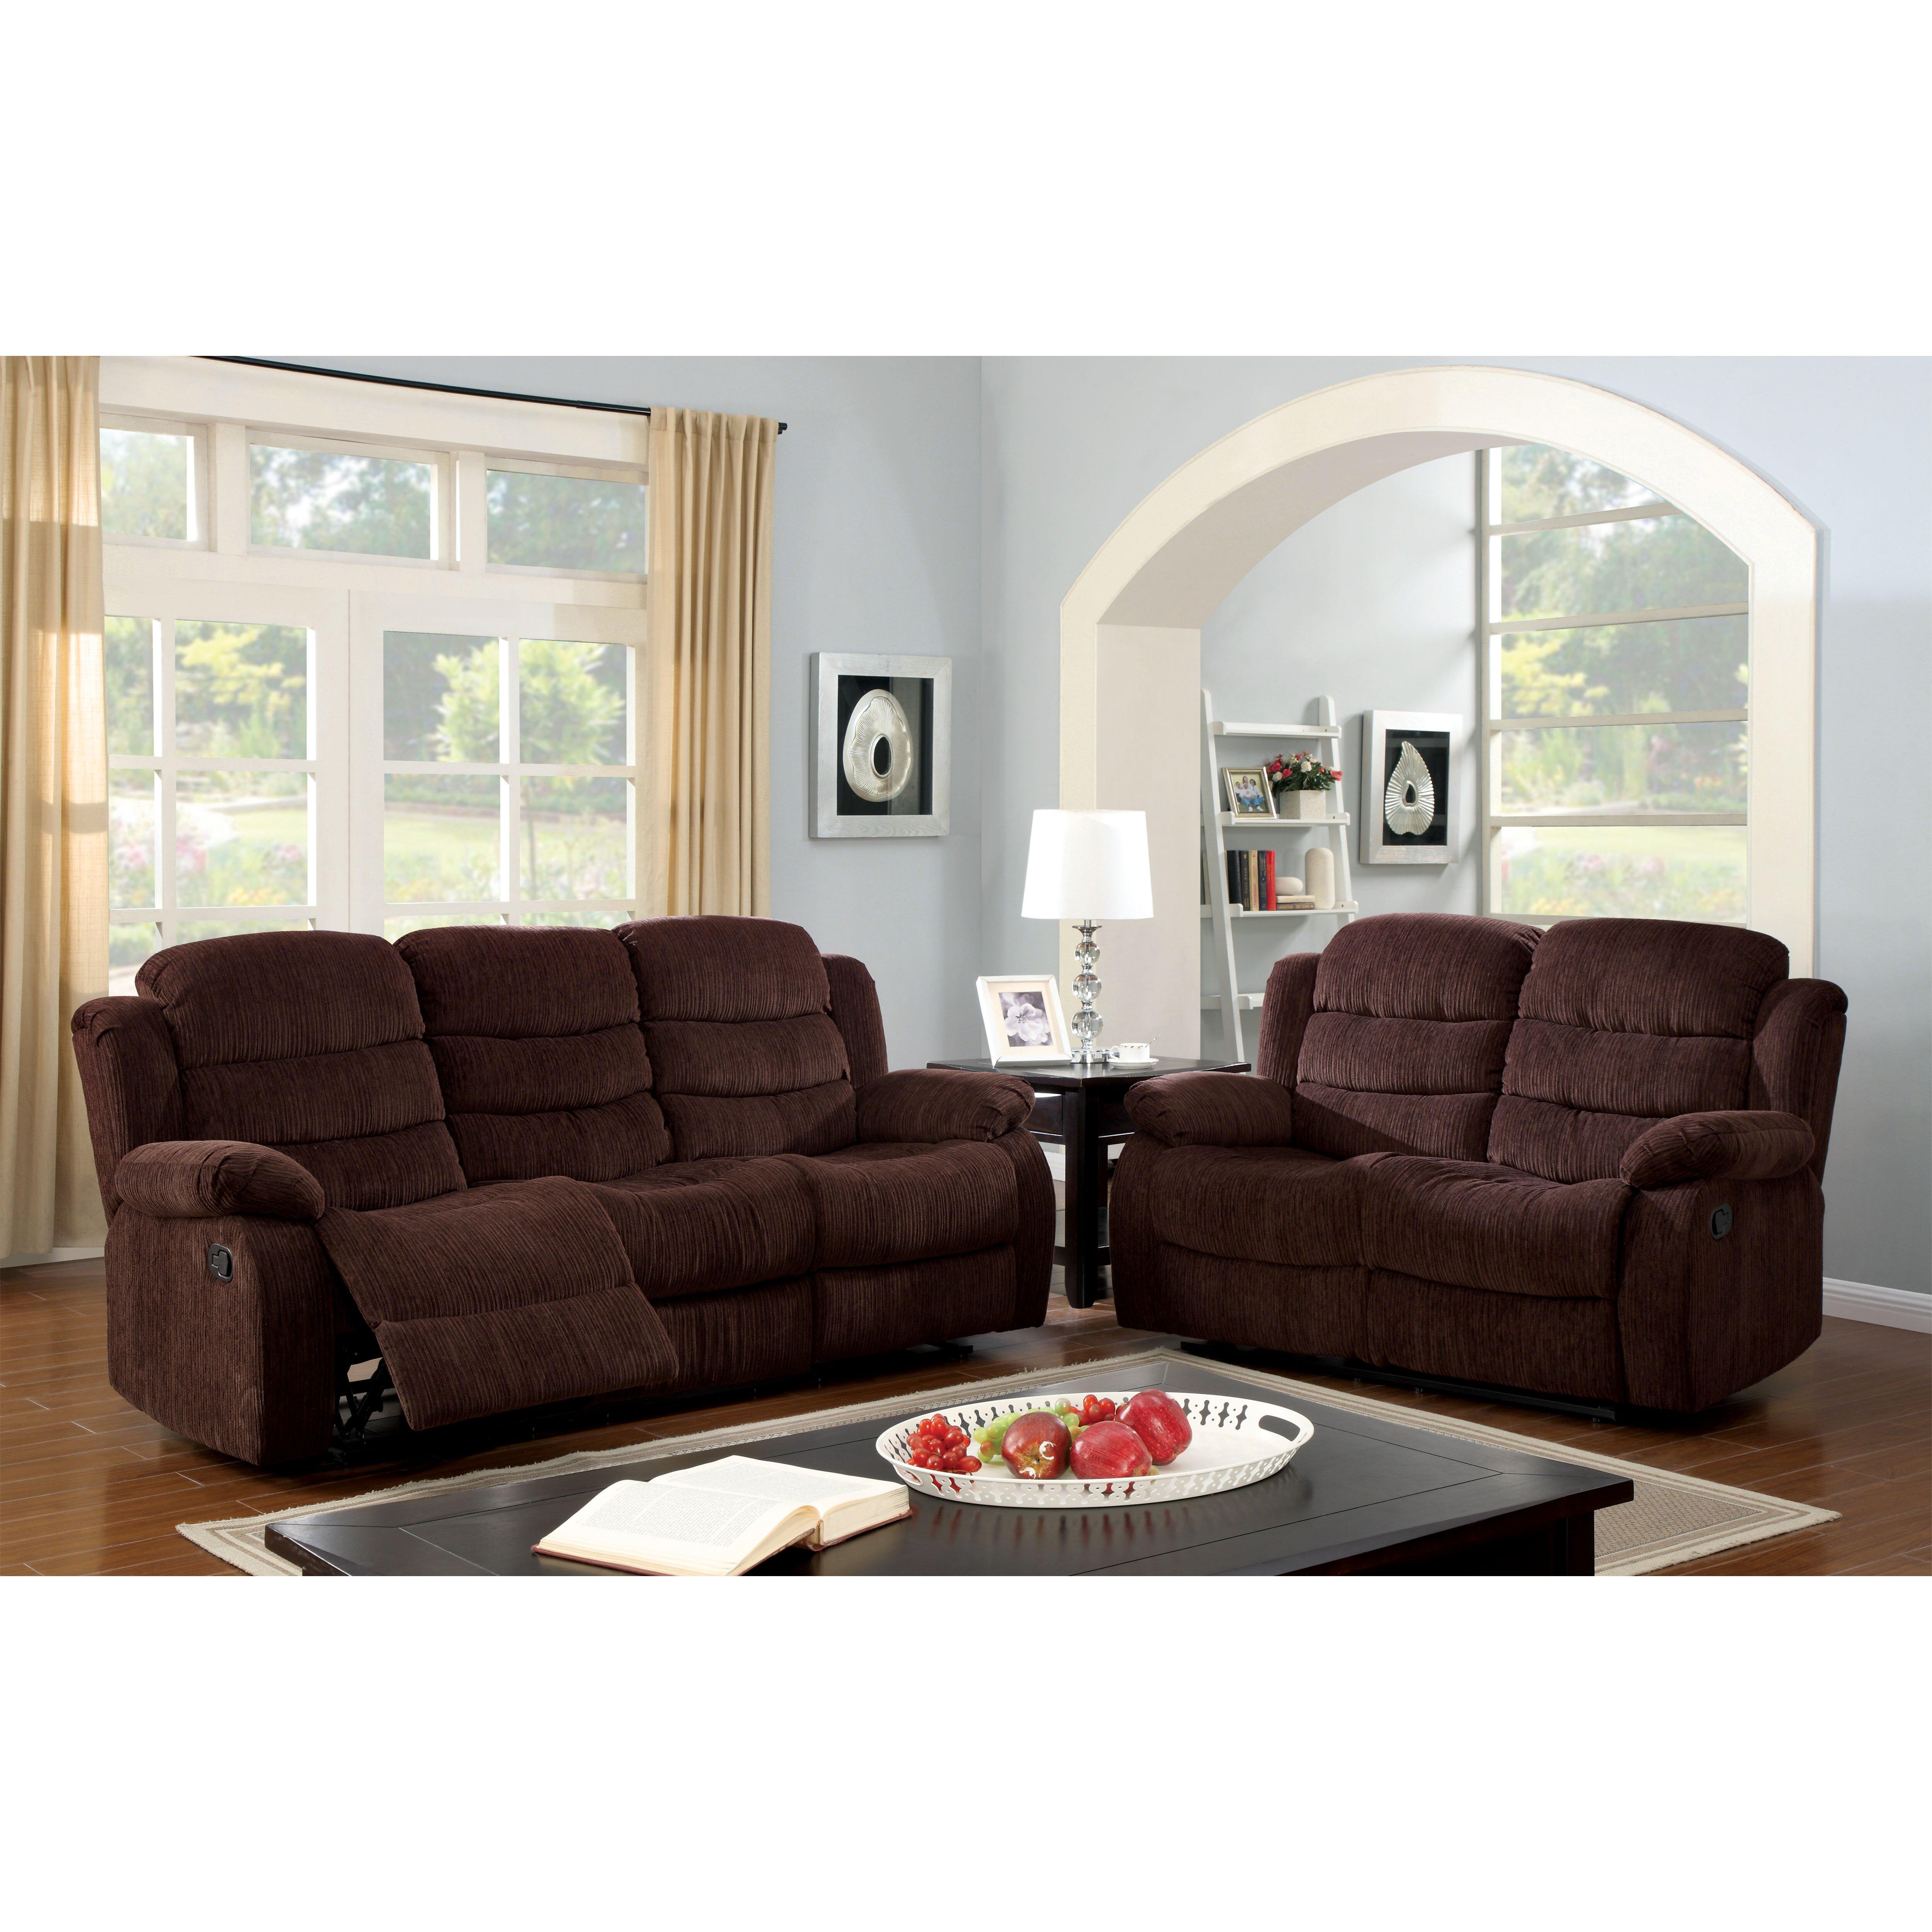 Hokku designs fergstein reclining loveseat reviews wayfair for Hokku designs living room furniture